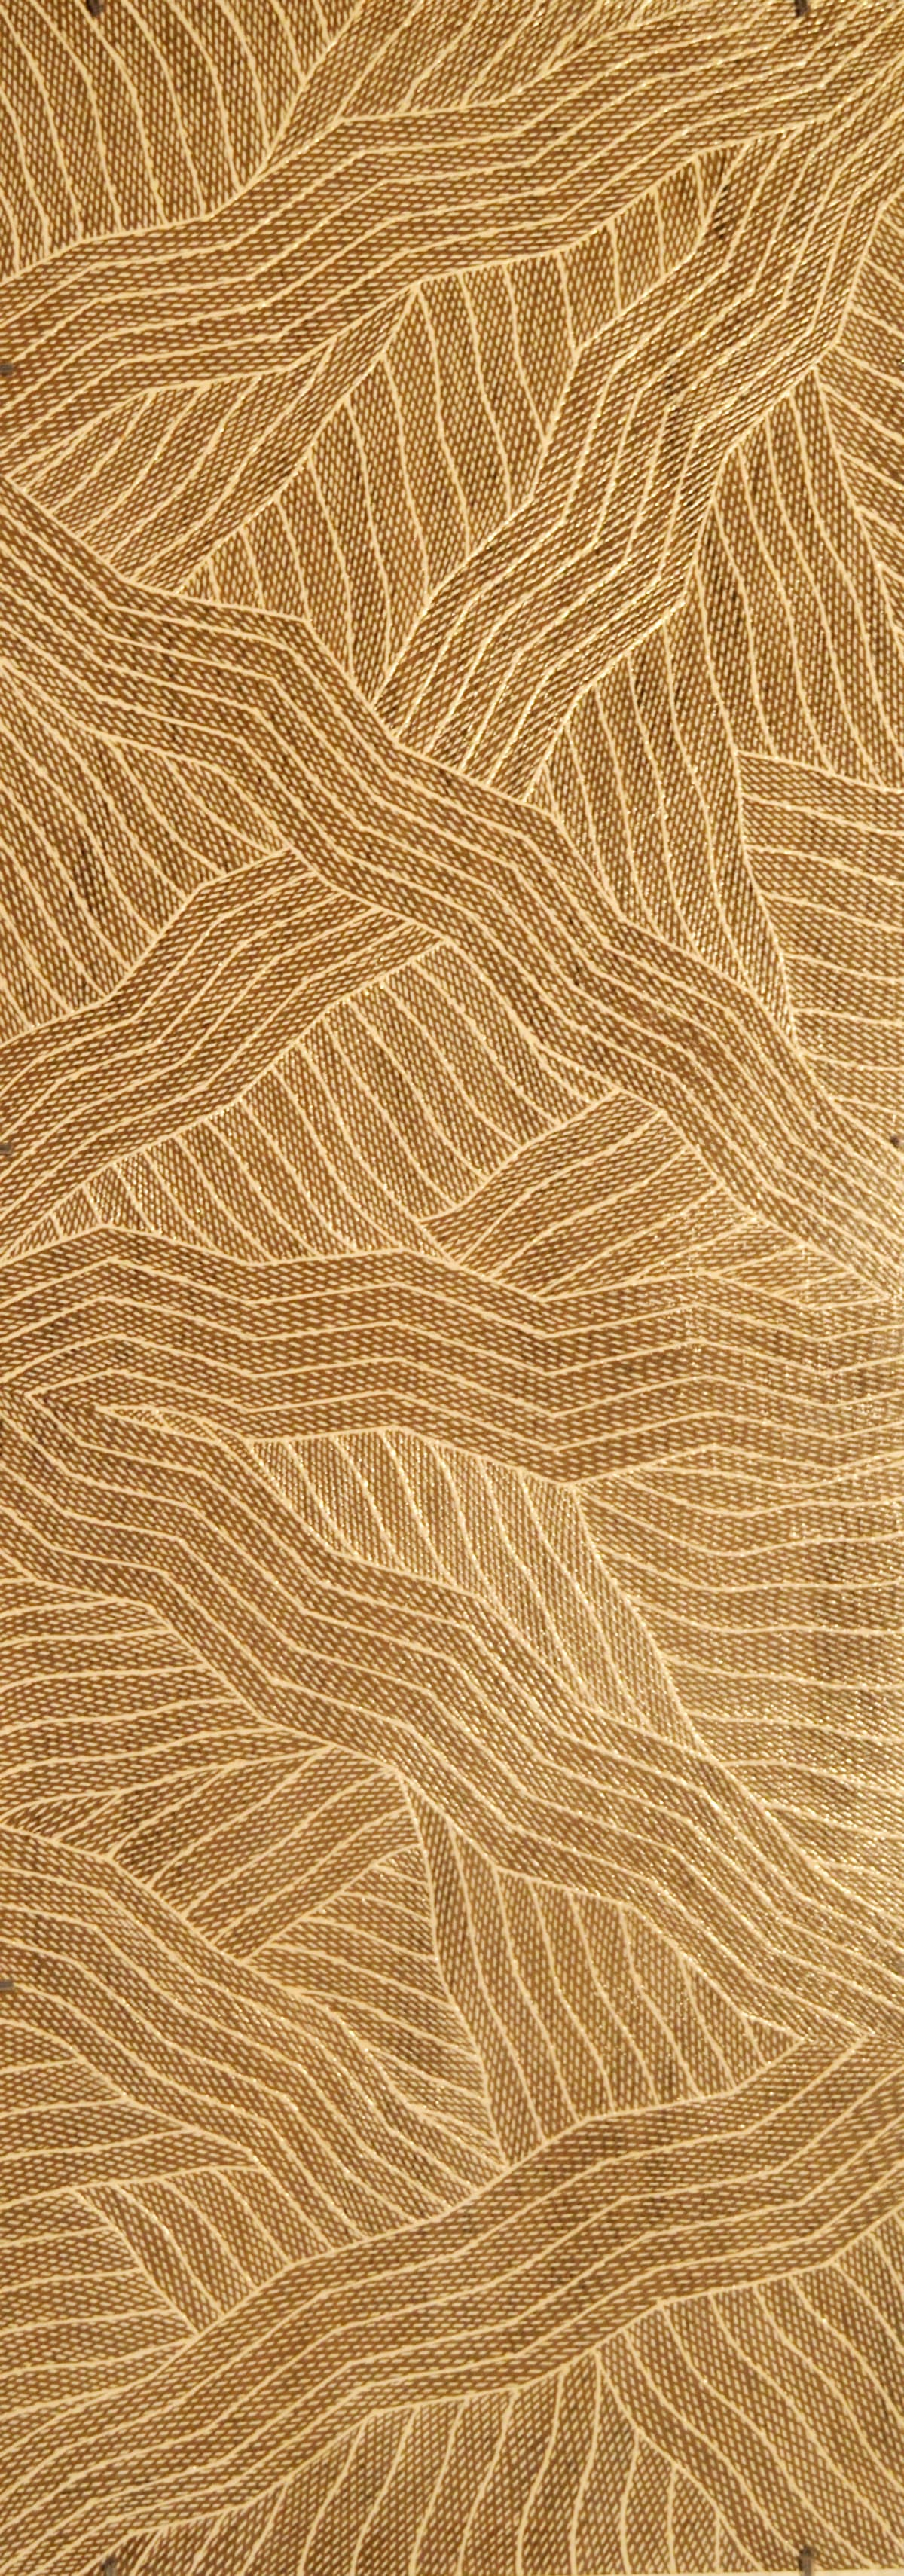 Manini Gumana Garraparra natural ochre and pigments on board 121 x 43 cm